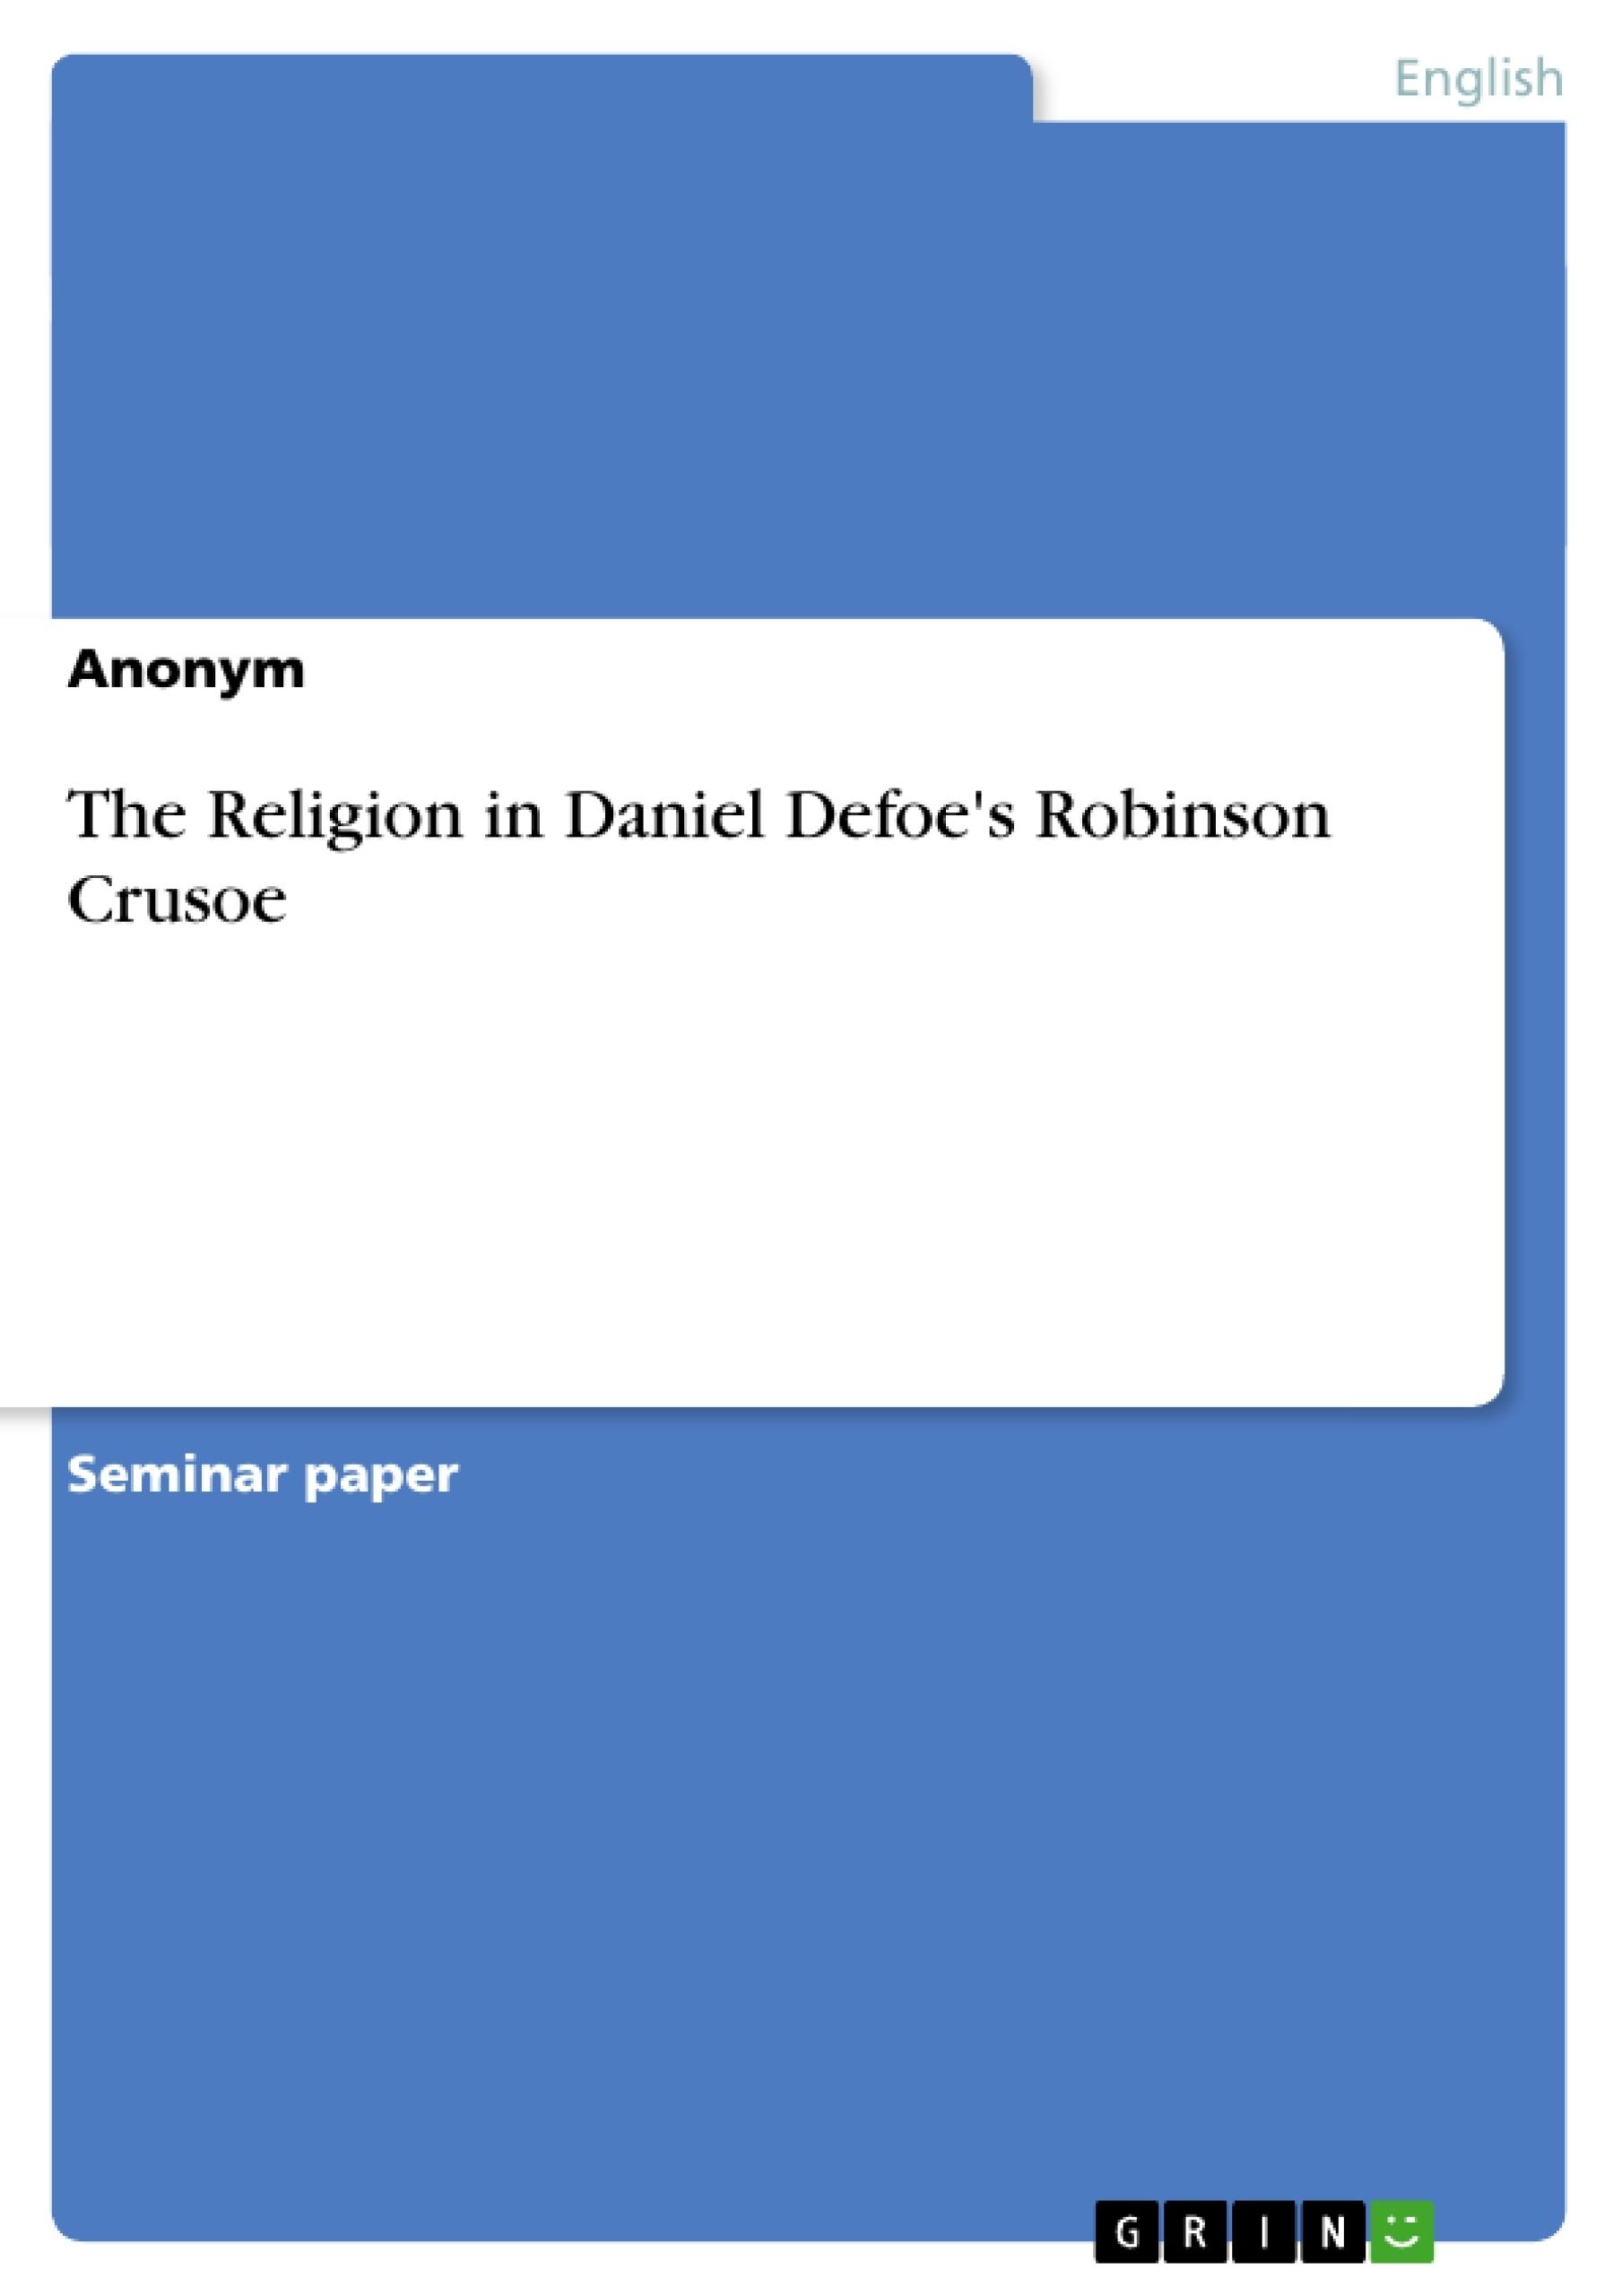 Title: The Religion in Daniel Defoe's Robinson Crusoe